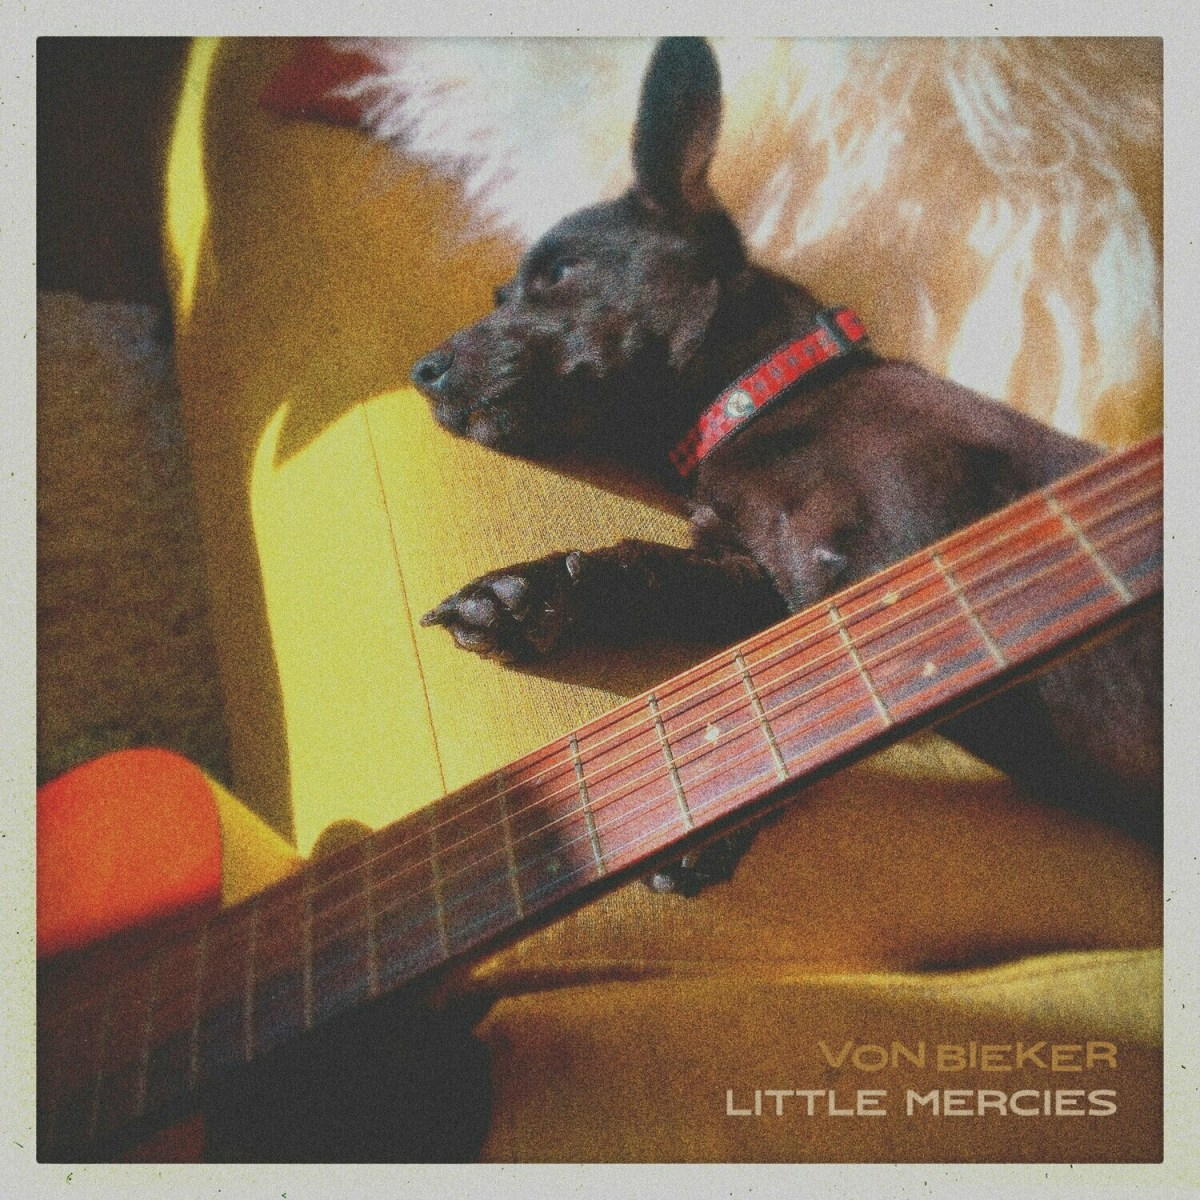 Little Mercies - Digital Single